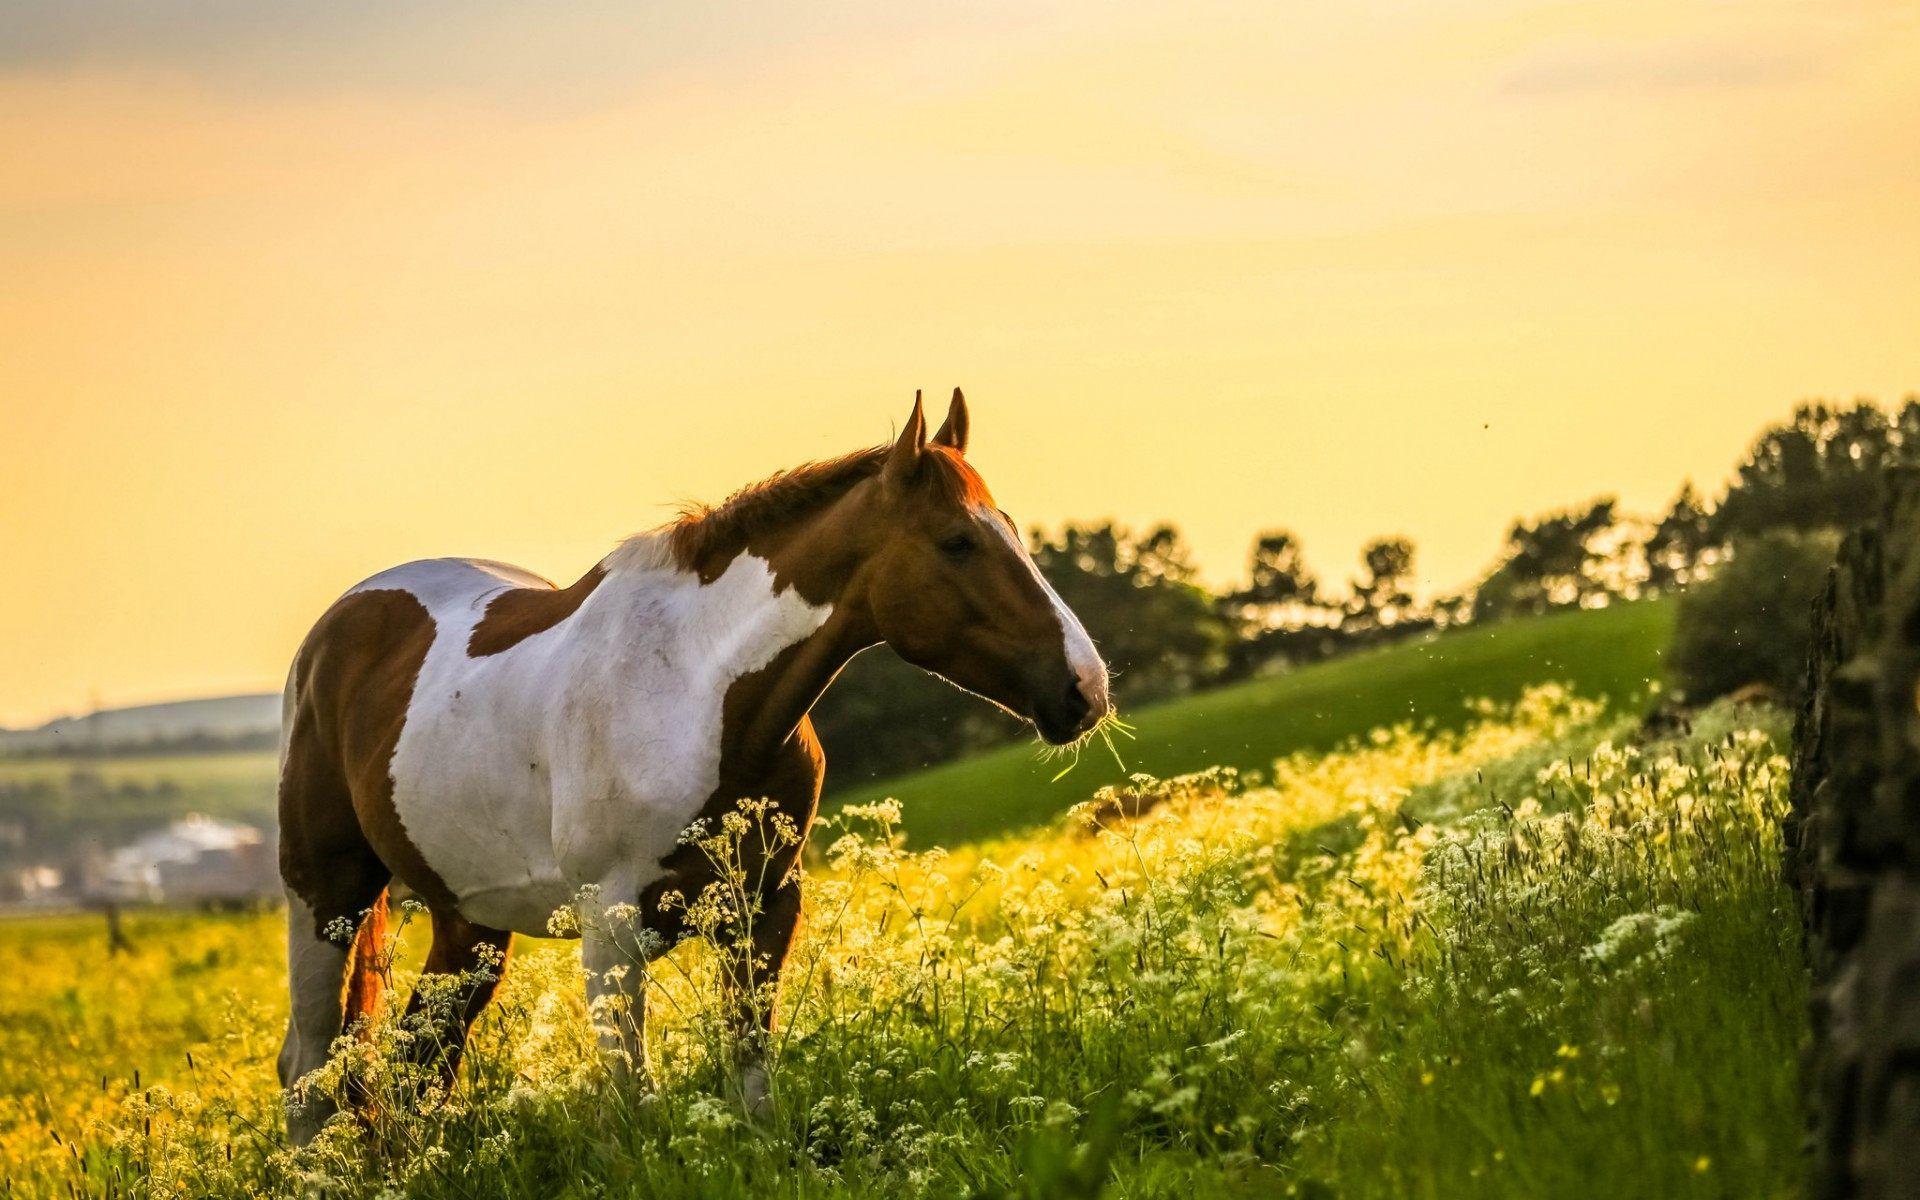 Лошадь HD Обои | Фон | 2327x1474 | ID:787511 - Wallpaper Abyss | 1200x1920